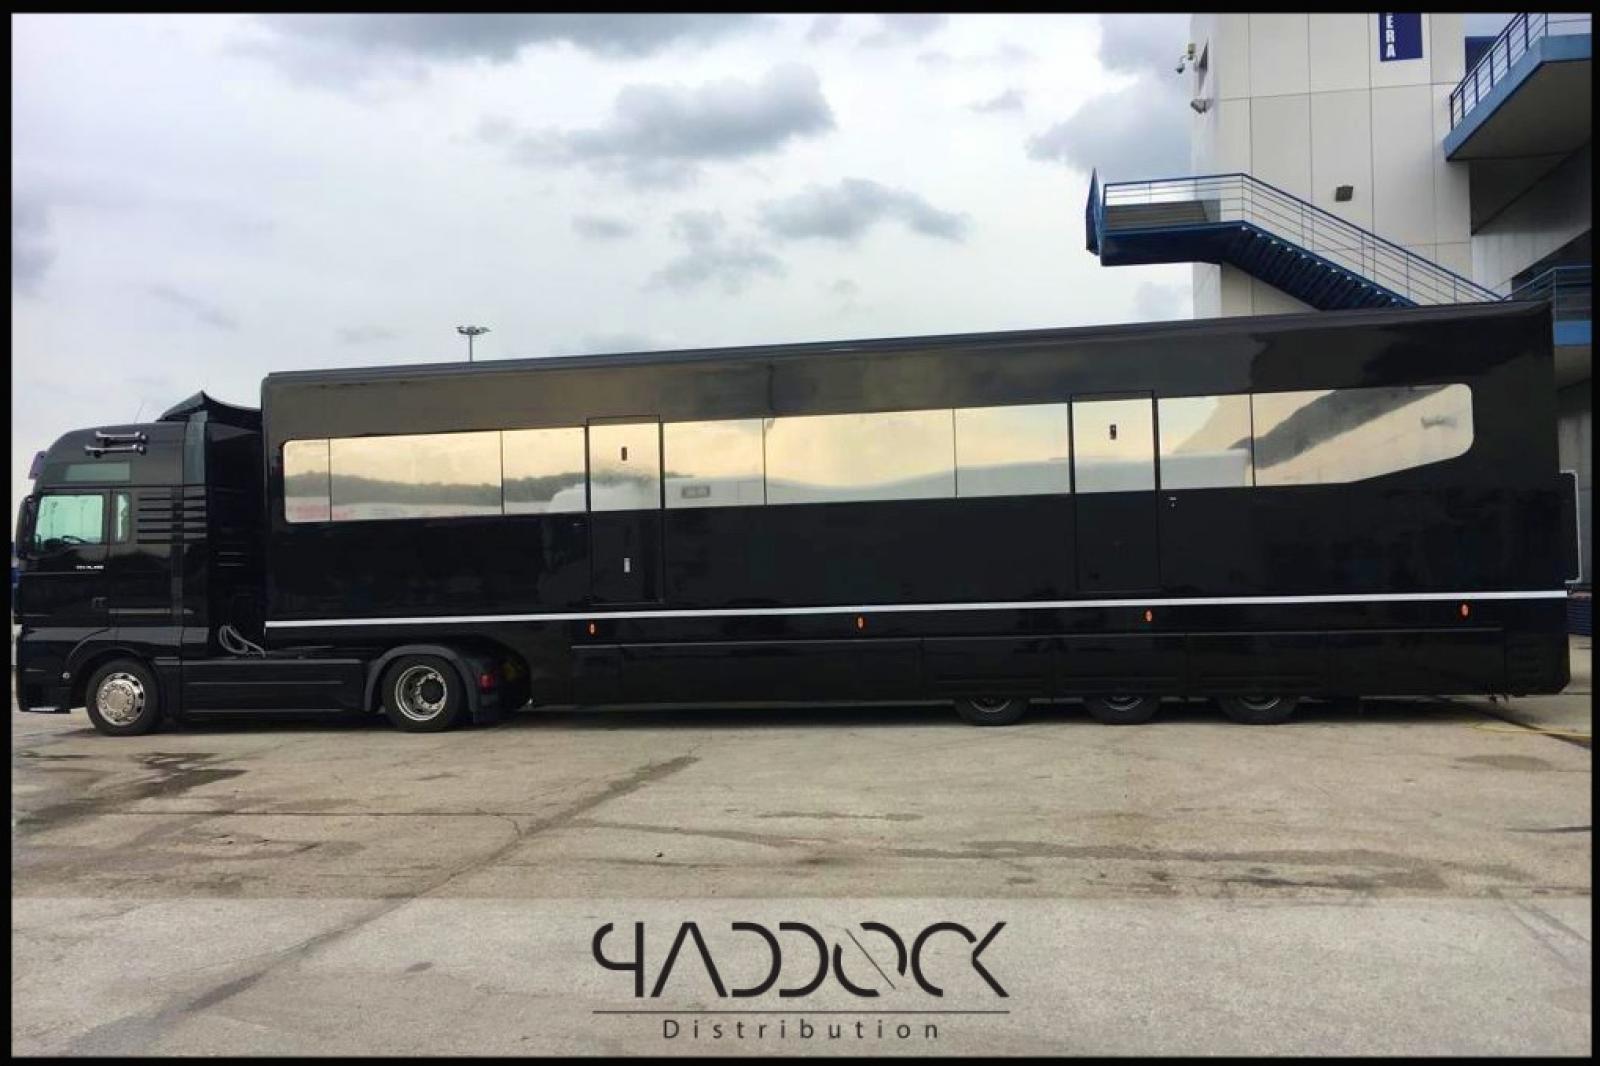 Used trailer WHEELBASE ENGINEERING by Paddock Distribution - 2